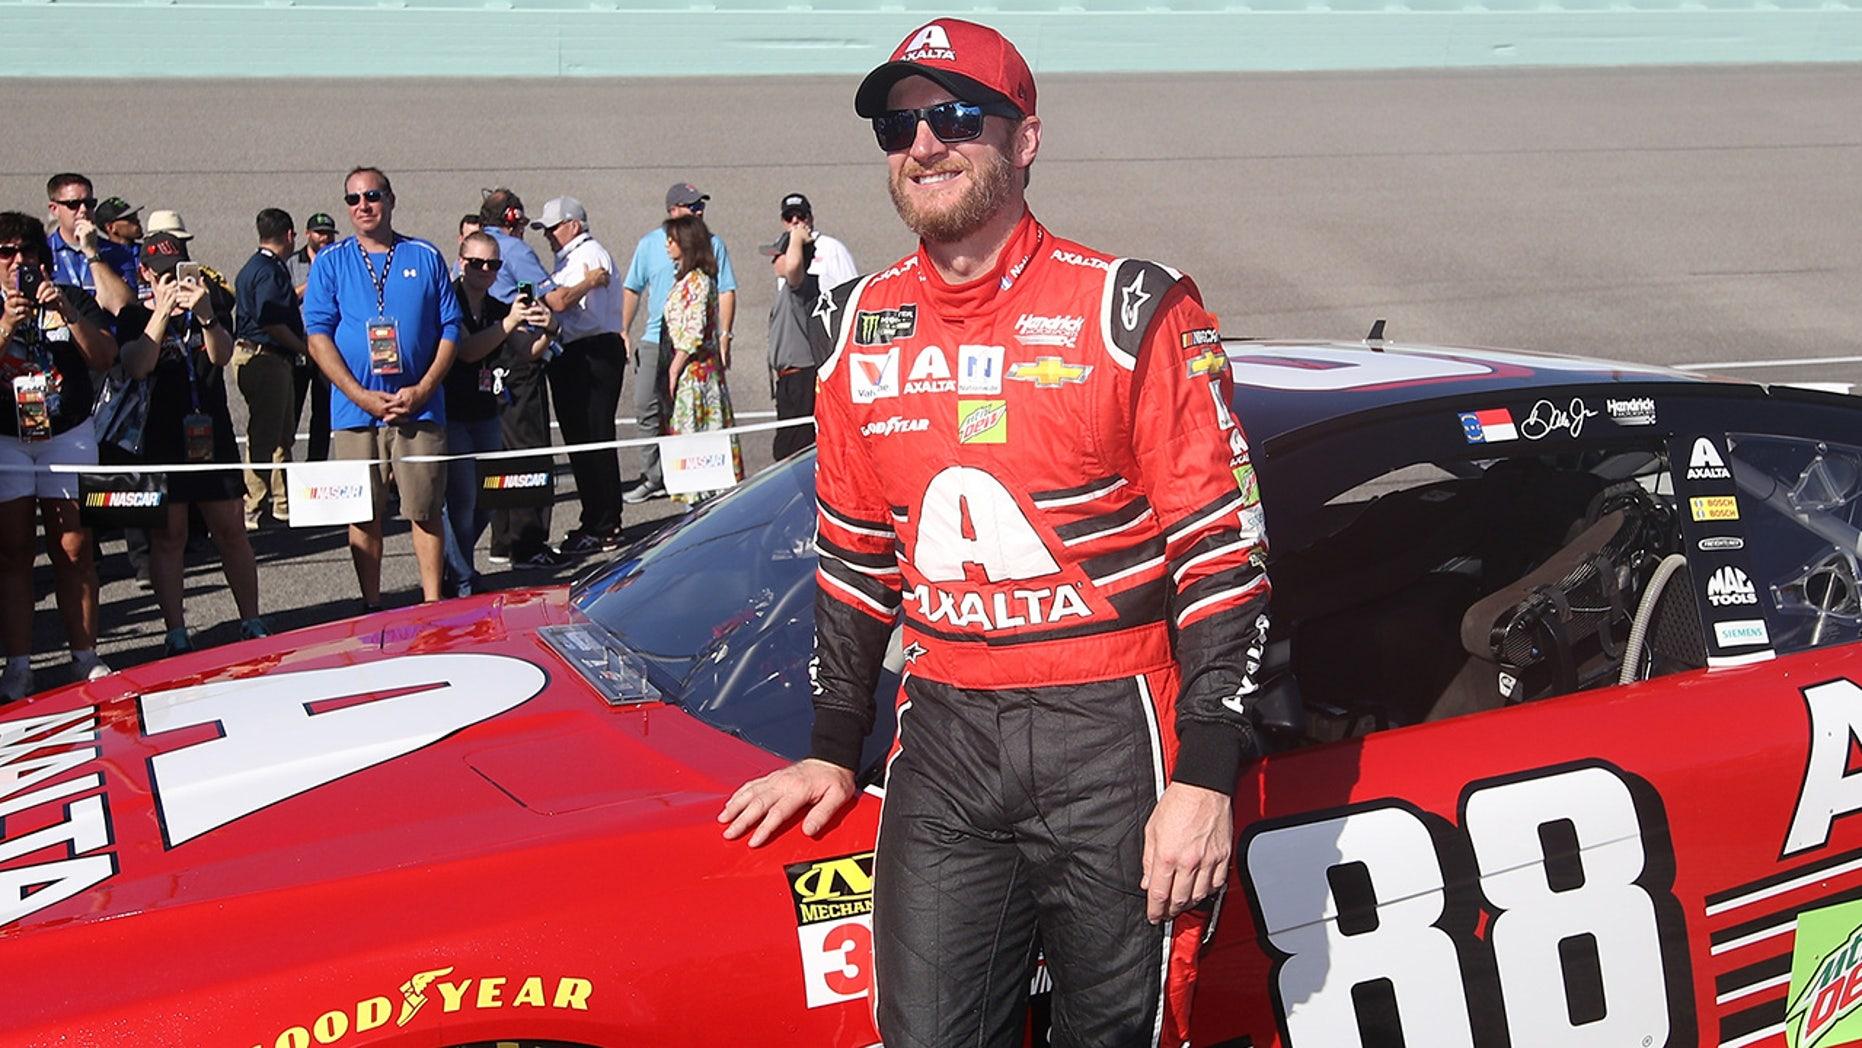 Earnhardt last drove at the NASCAR season finale in November 2017.